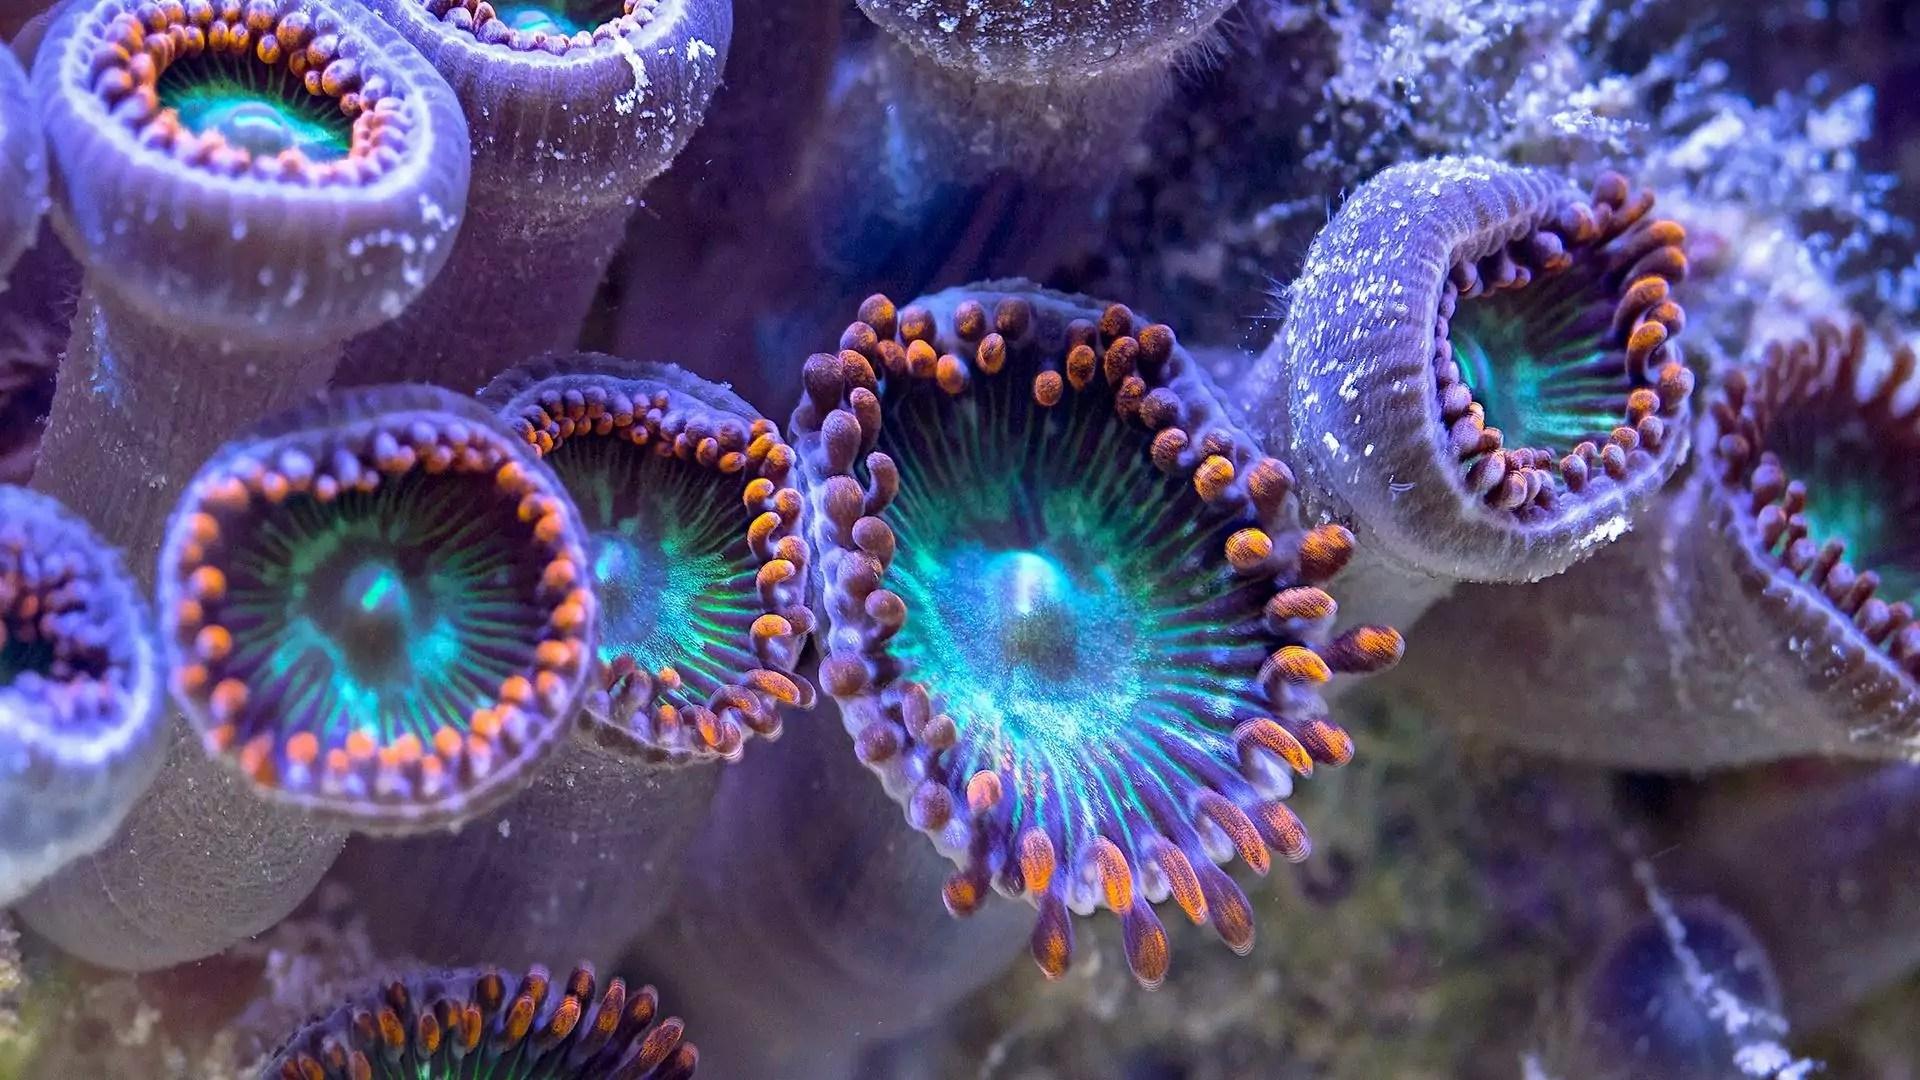 Underwater reefs greet the camera.